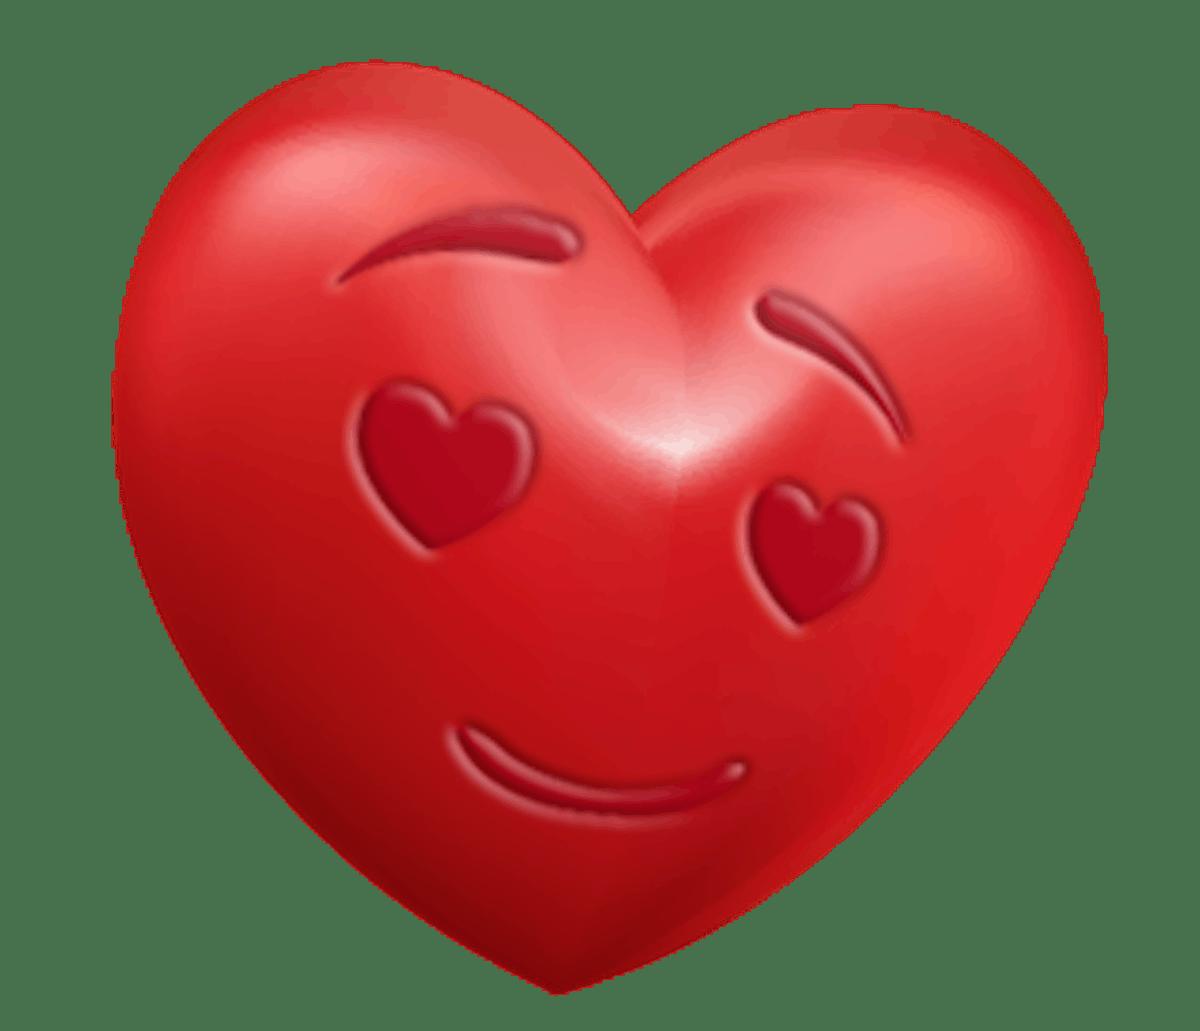 Welch's Valentine's emoji fruit snacks are back for 2020.